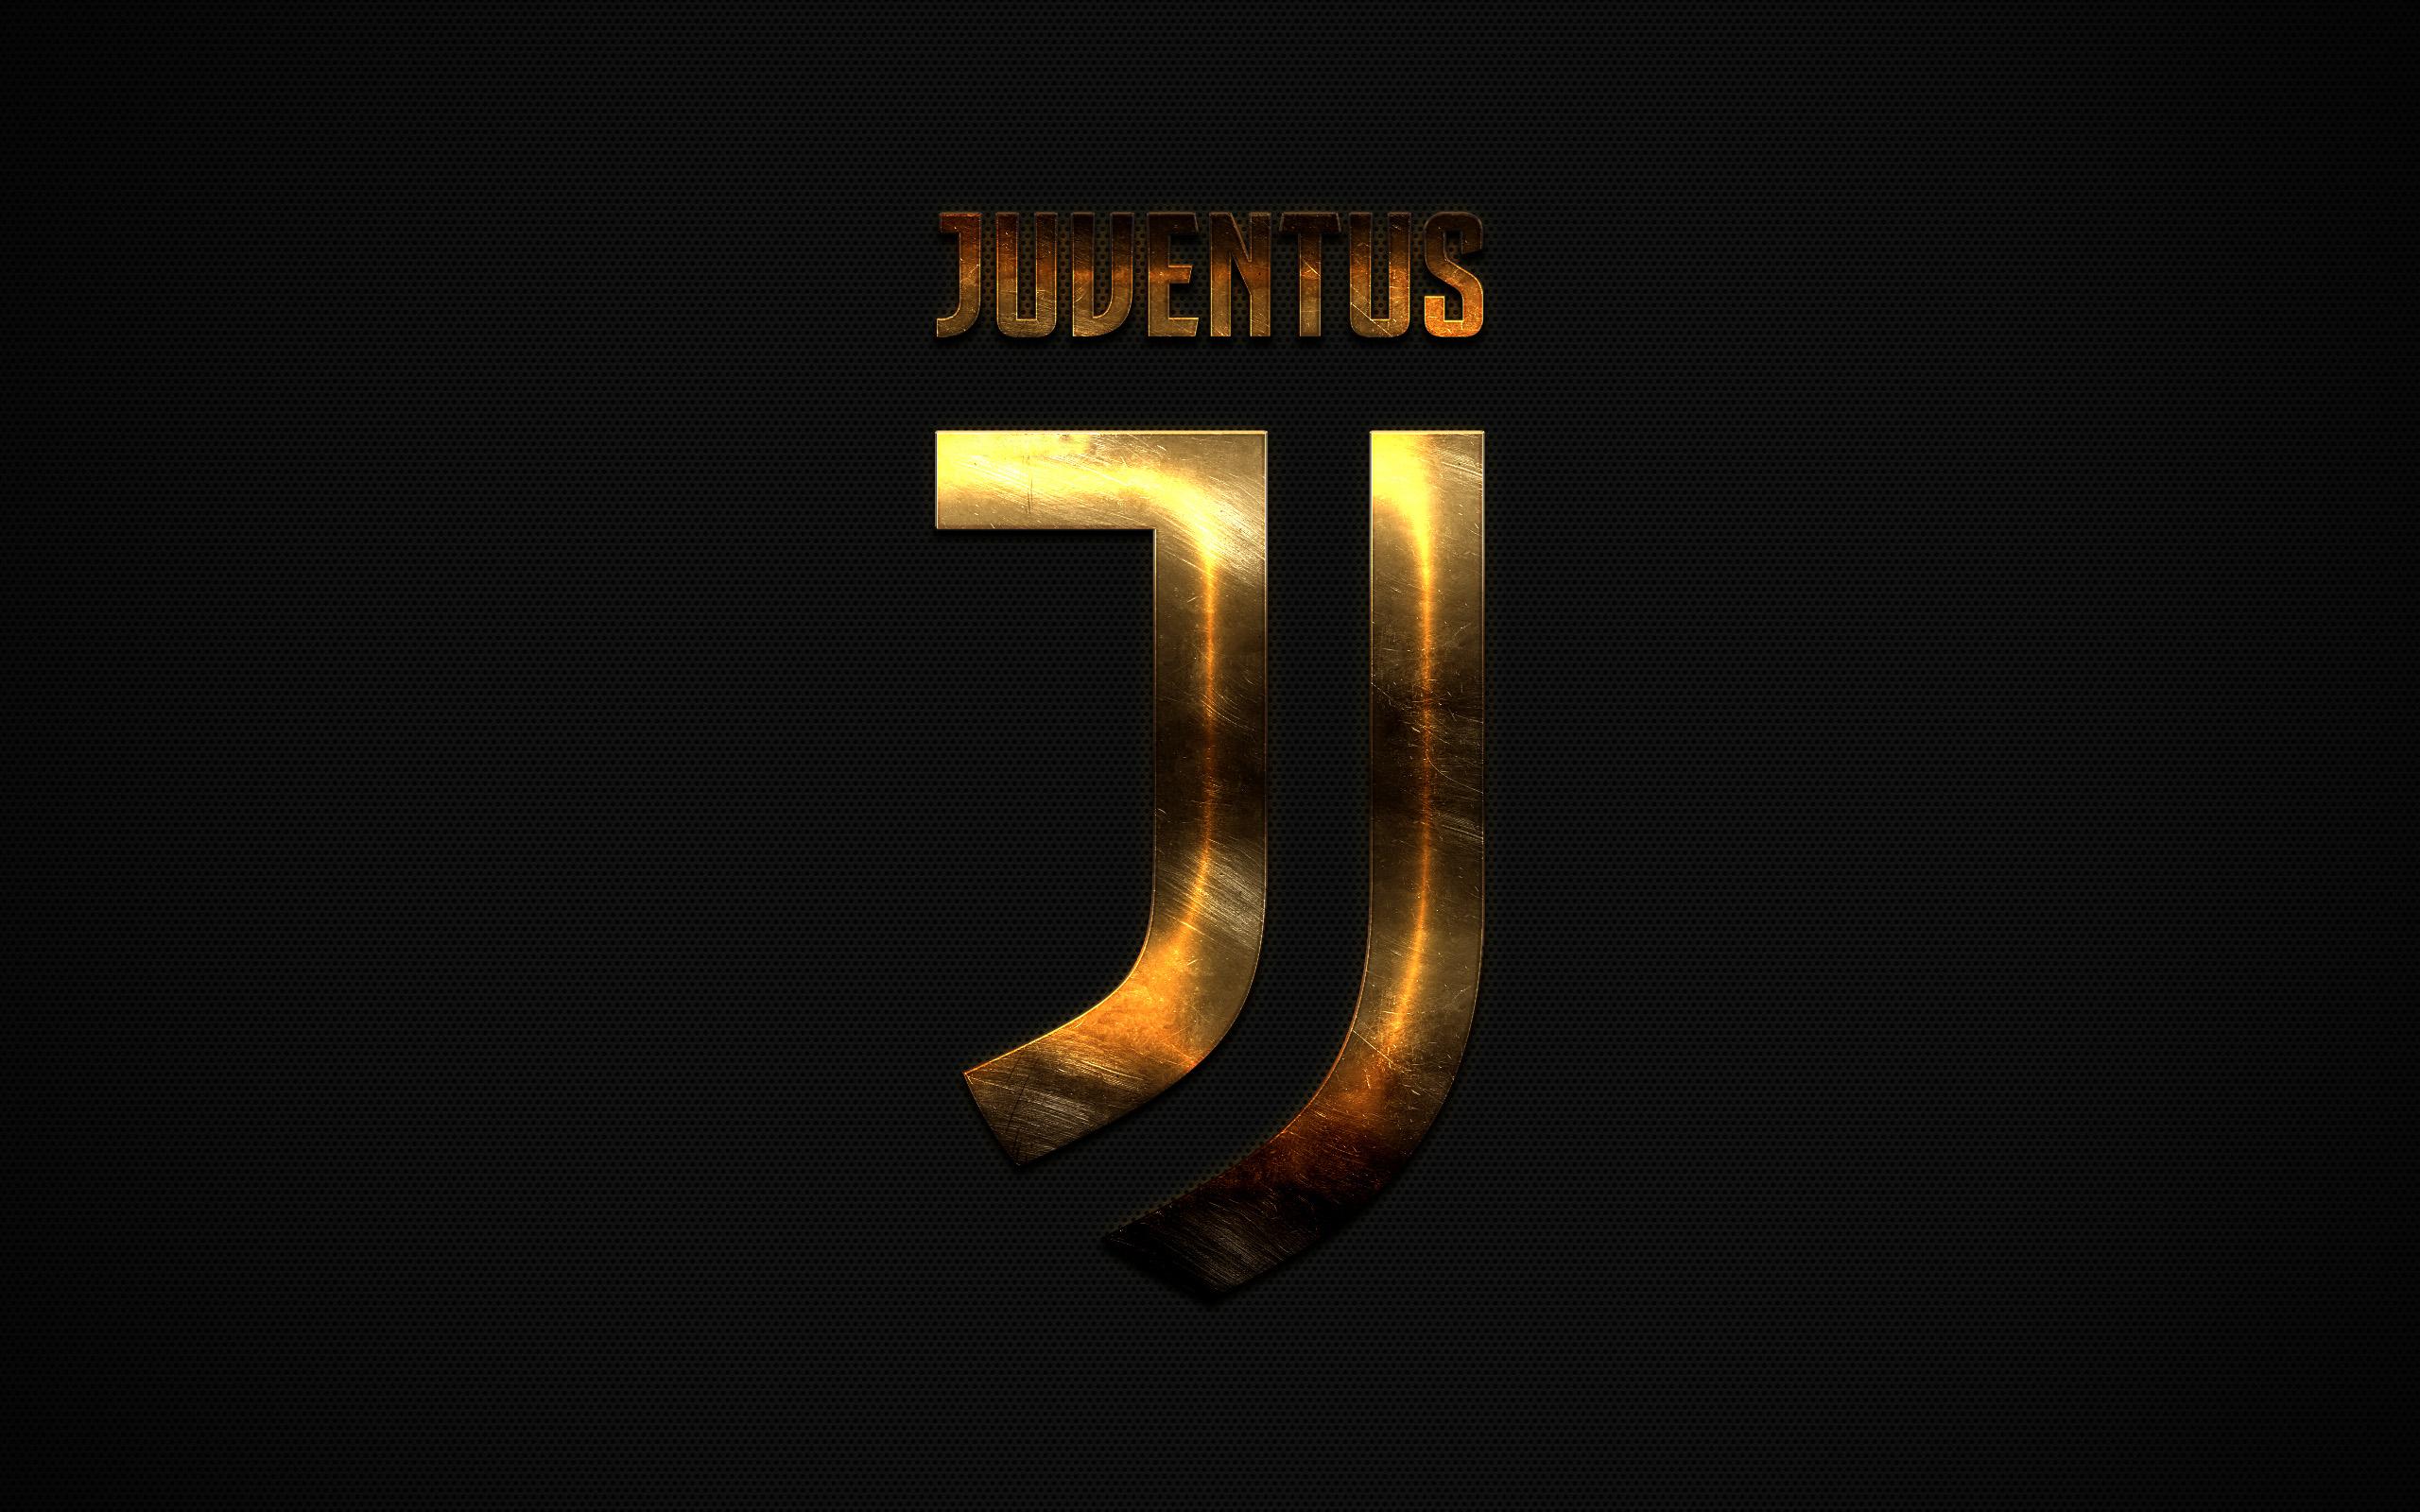 Juve Logo HD Wallpaper | Background Image | 2560x1600 | ID ...